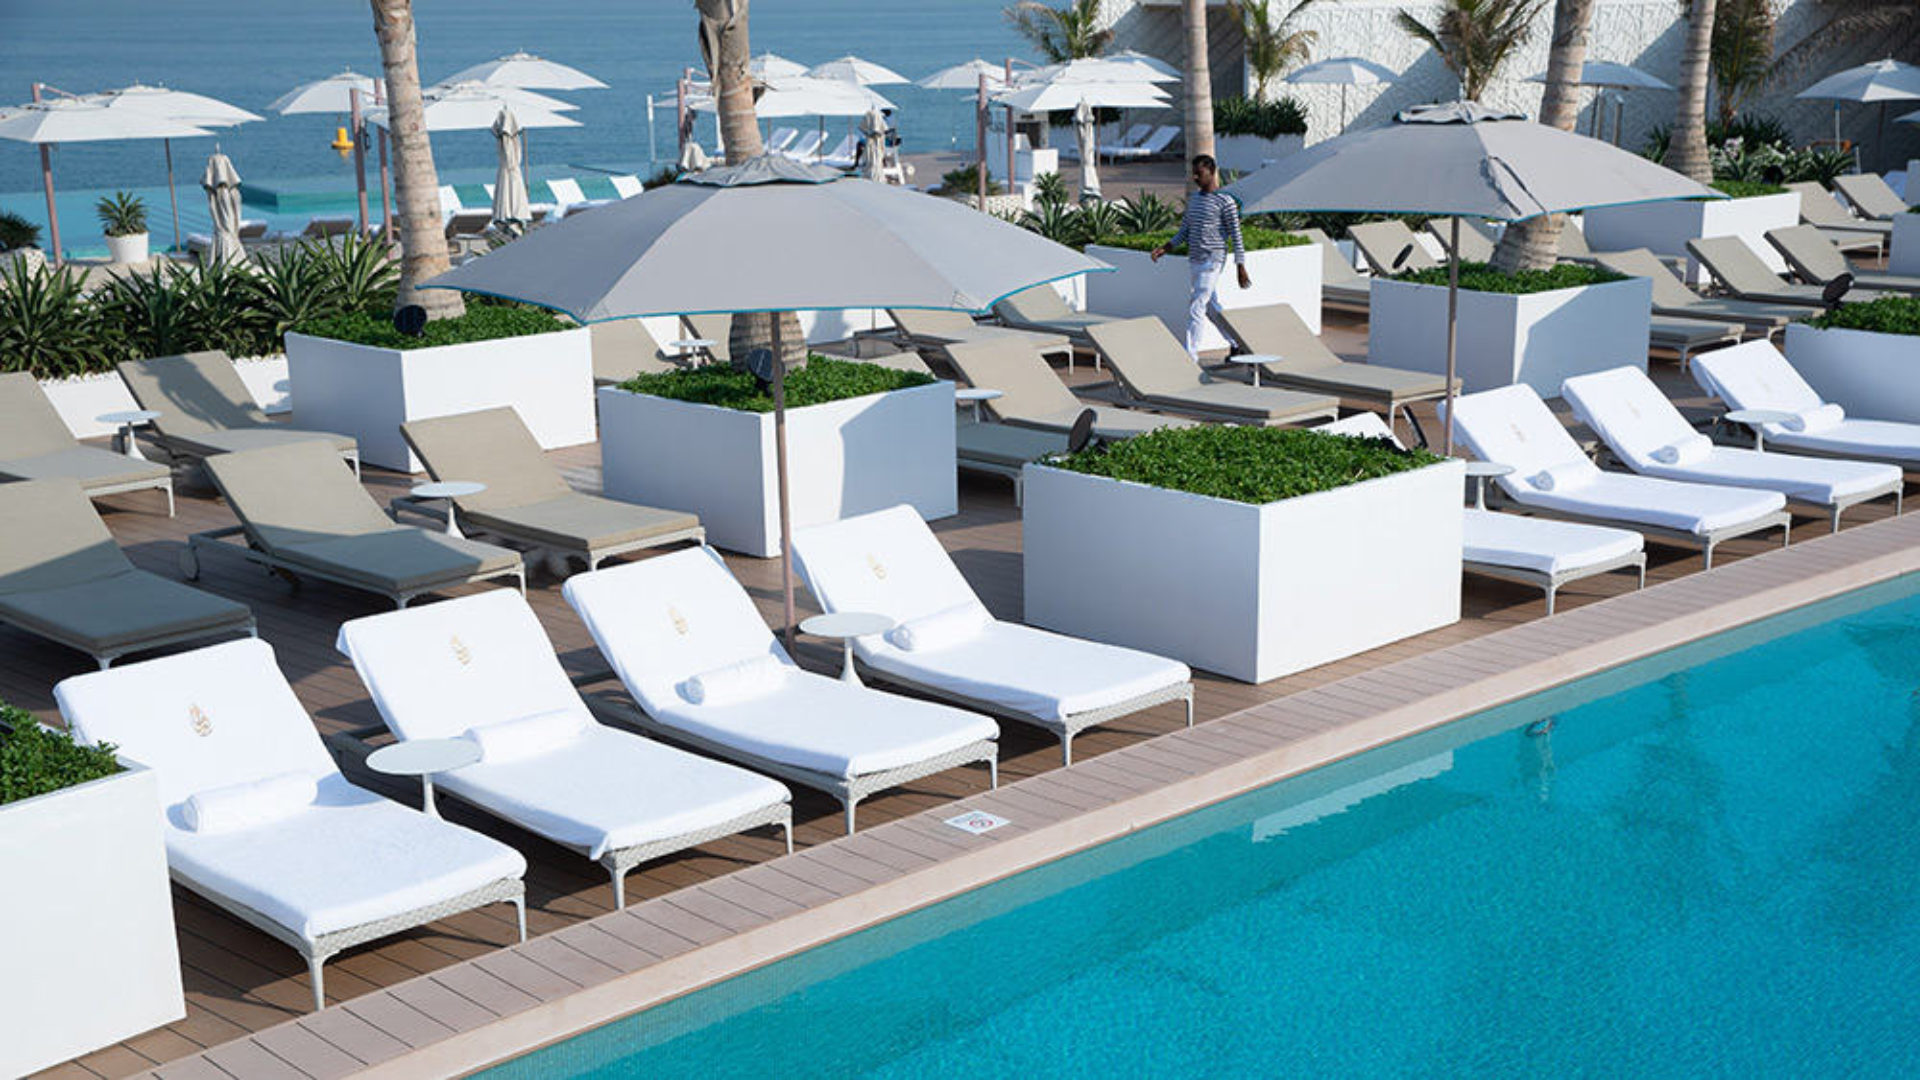 Sunloungers at the pool at the Burj Al Arab